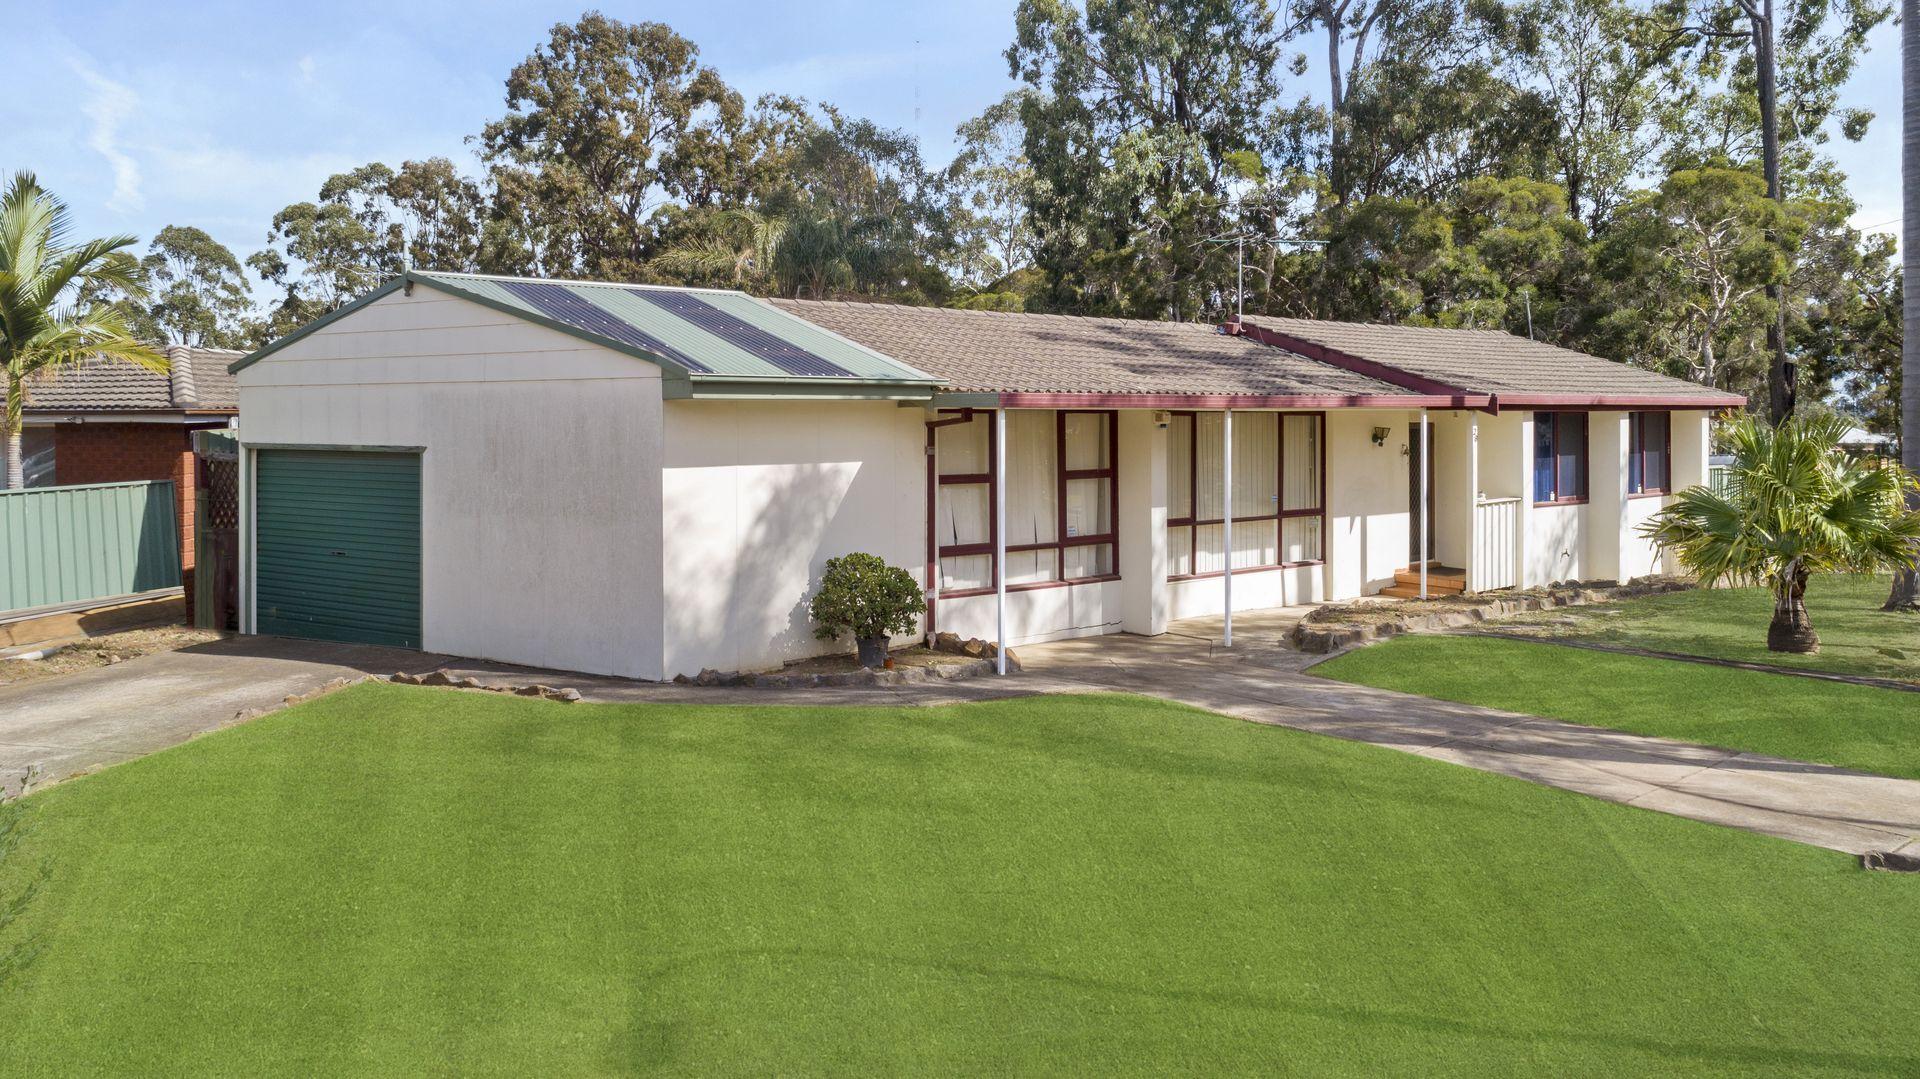 28 Acacia Ave, Prestons NSW 2170, Image 0